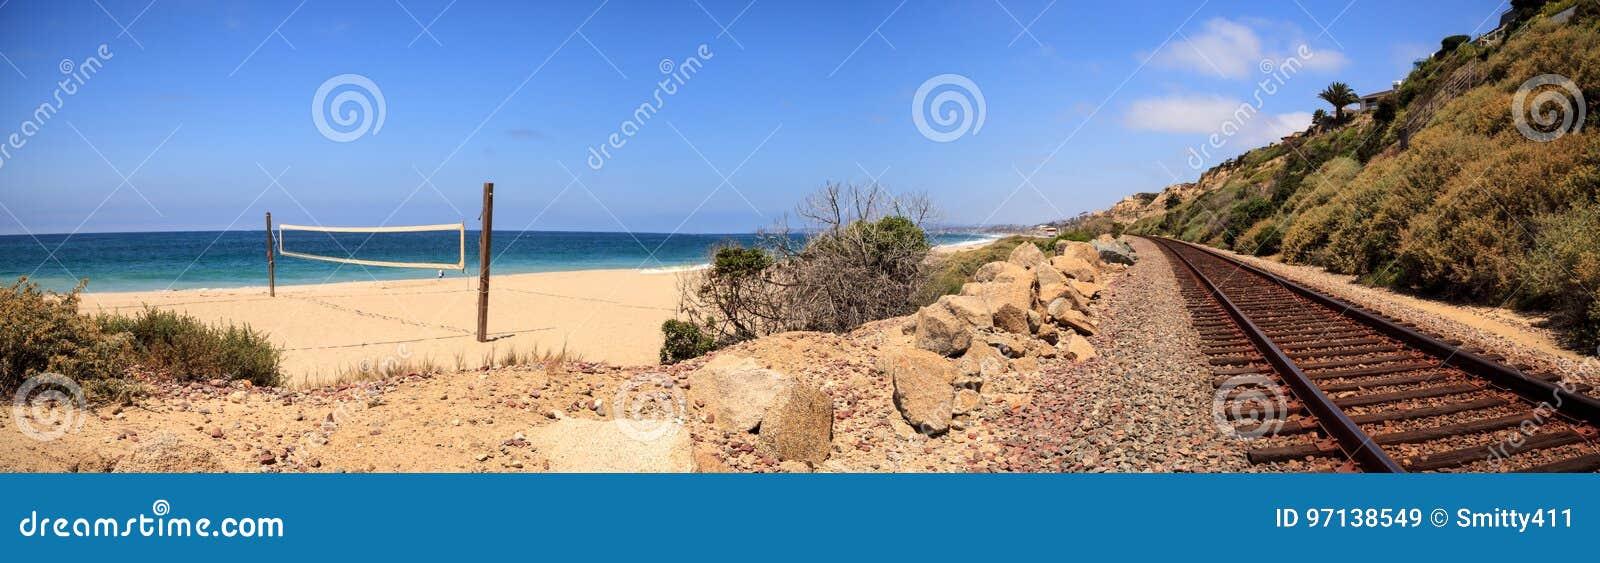 Volleyball netto op het zand bij San Clemente State Beach